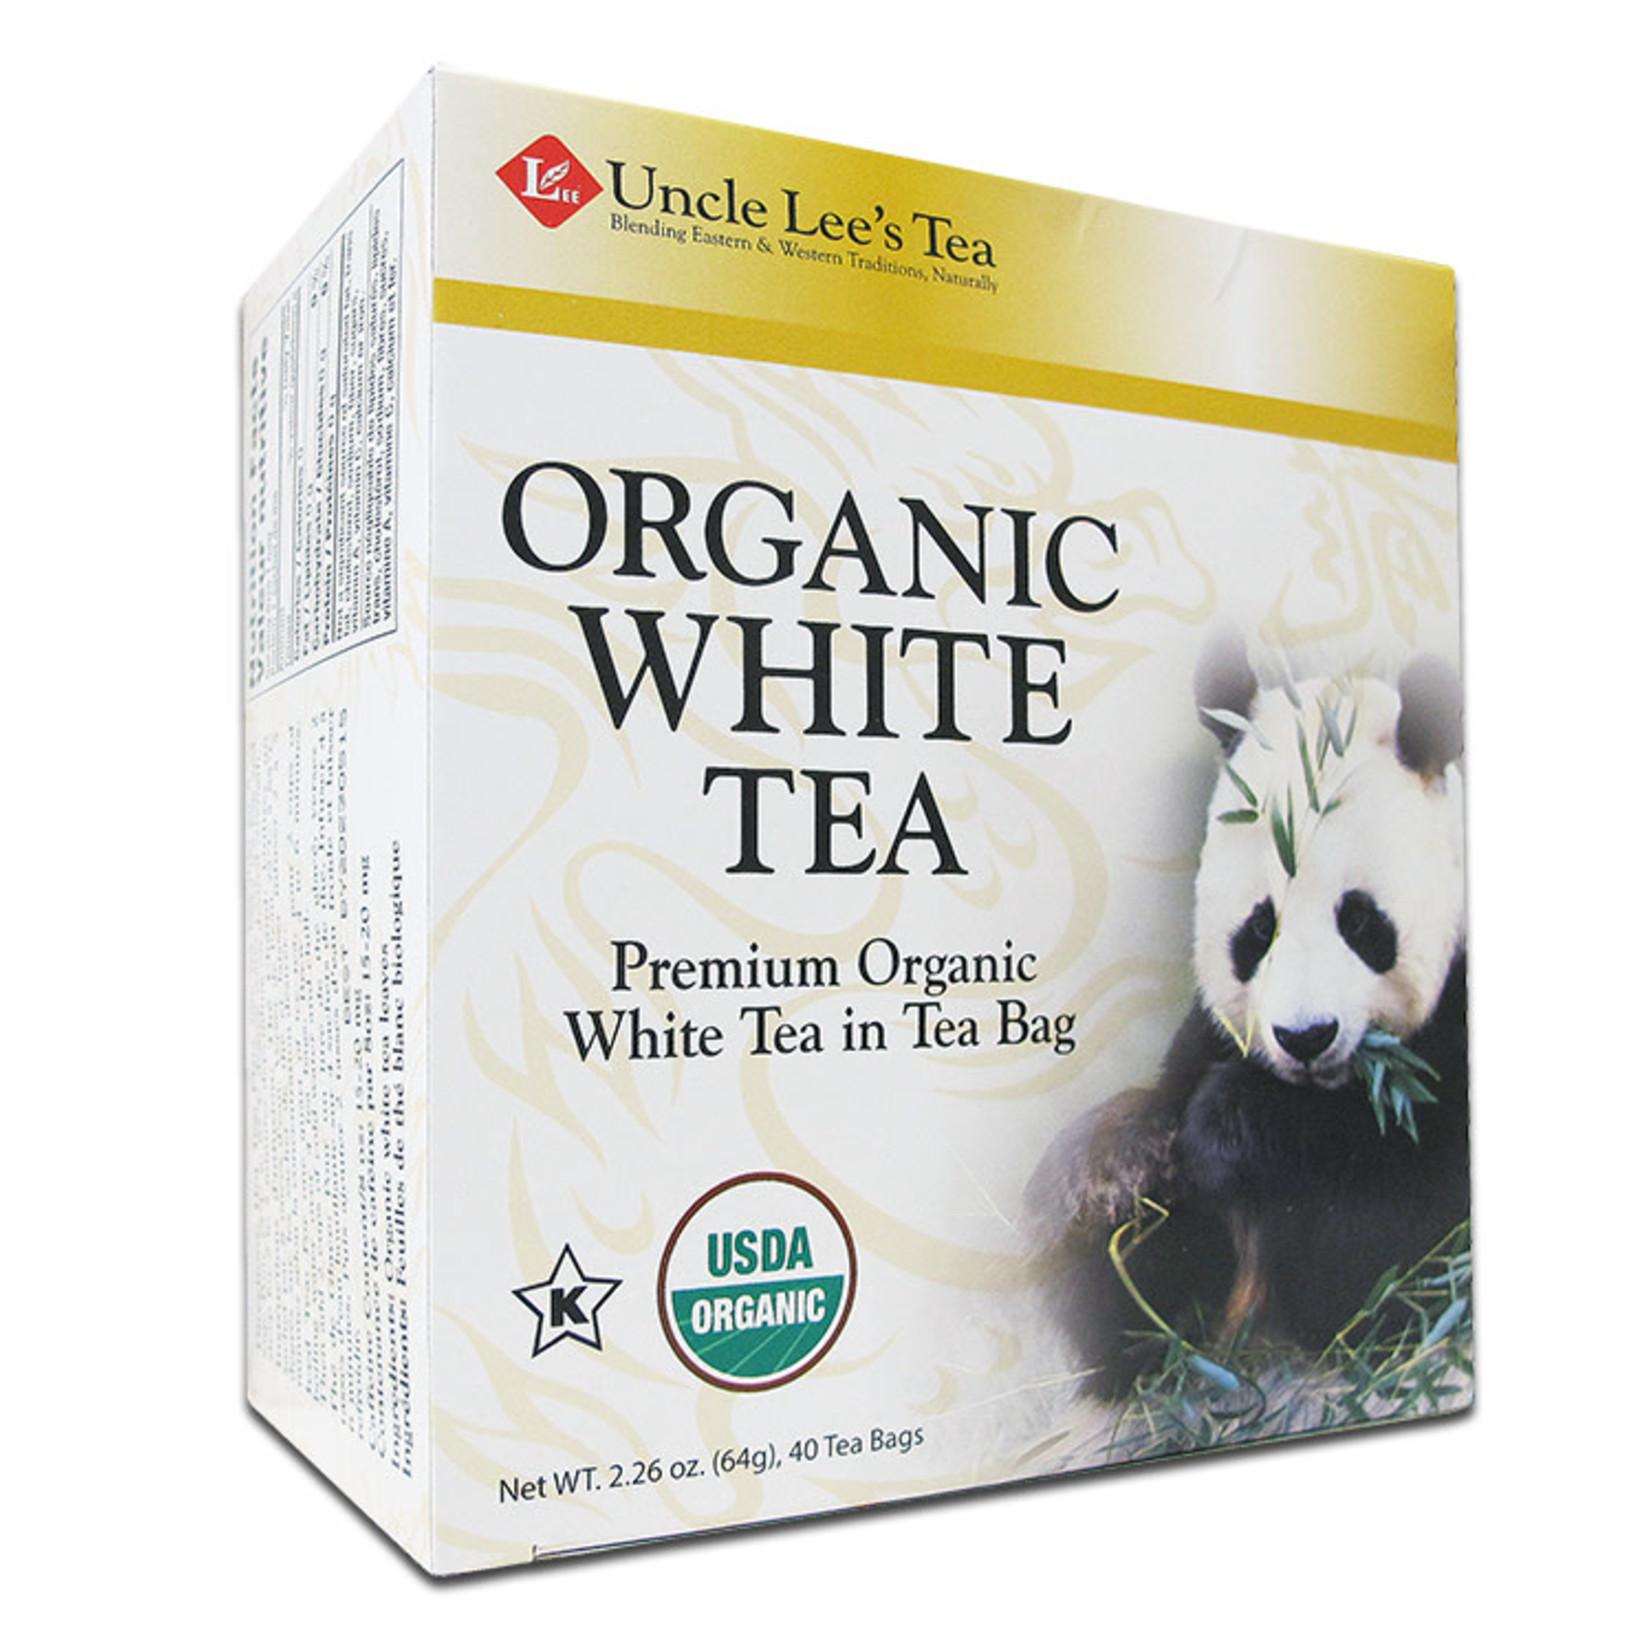 Uncle Lee's Uncle Lee's Organic White Tea 40 tea bags